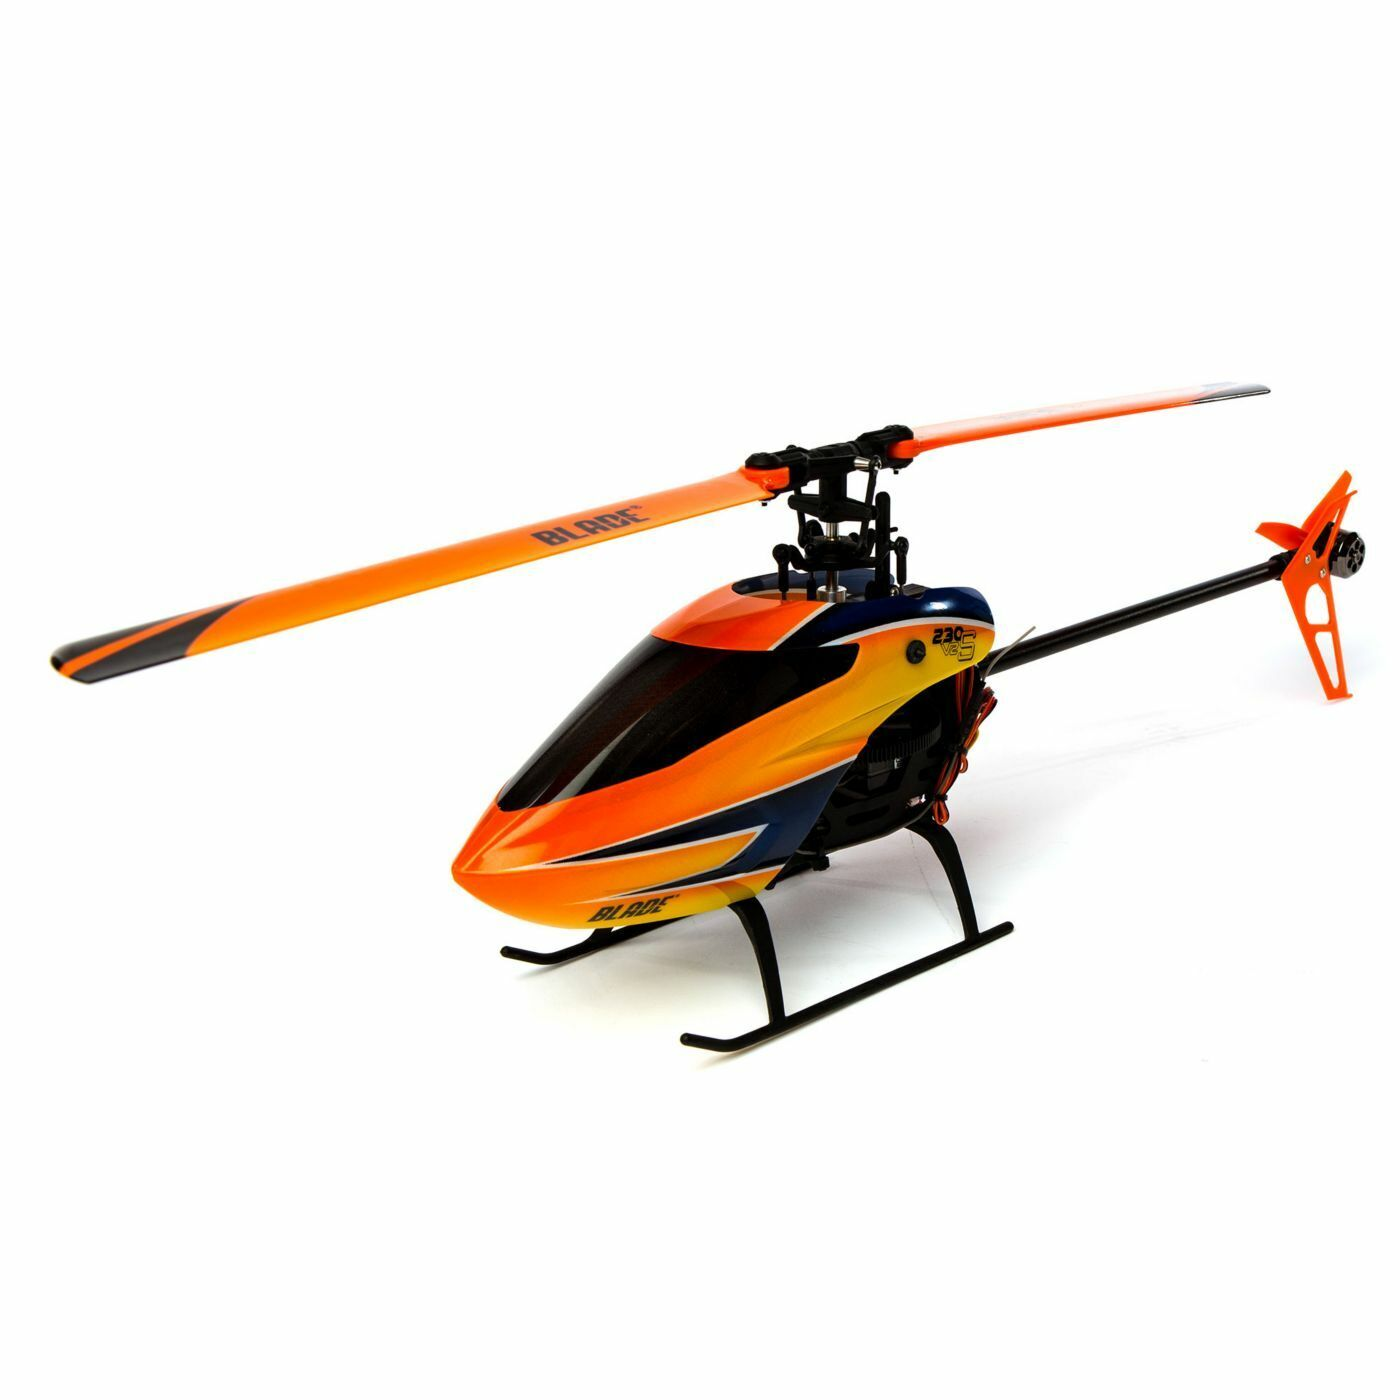 Blade 230S V2 Mini Elicottero  3D RC Safe Mode 2 e 1 RTF BLH1400EU  risparmia fino al 50%